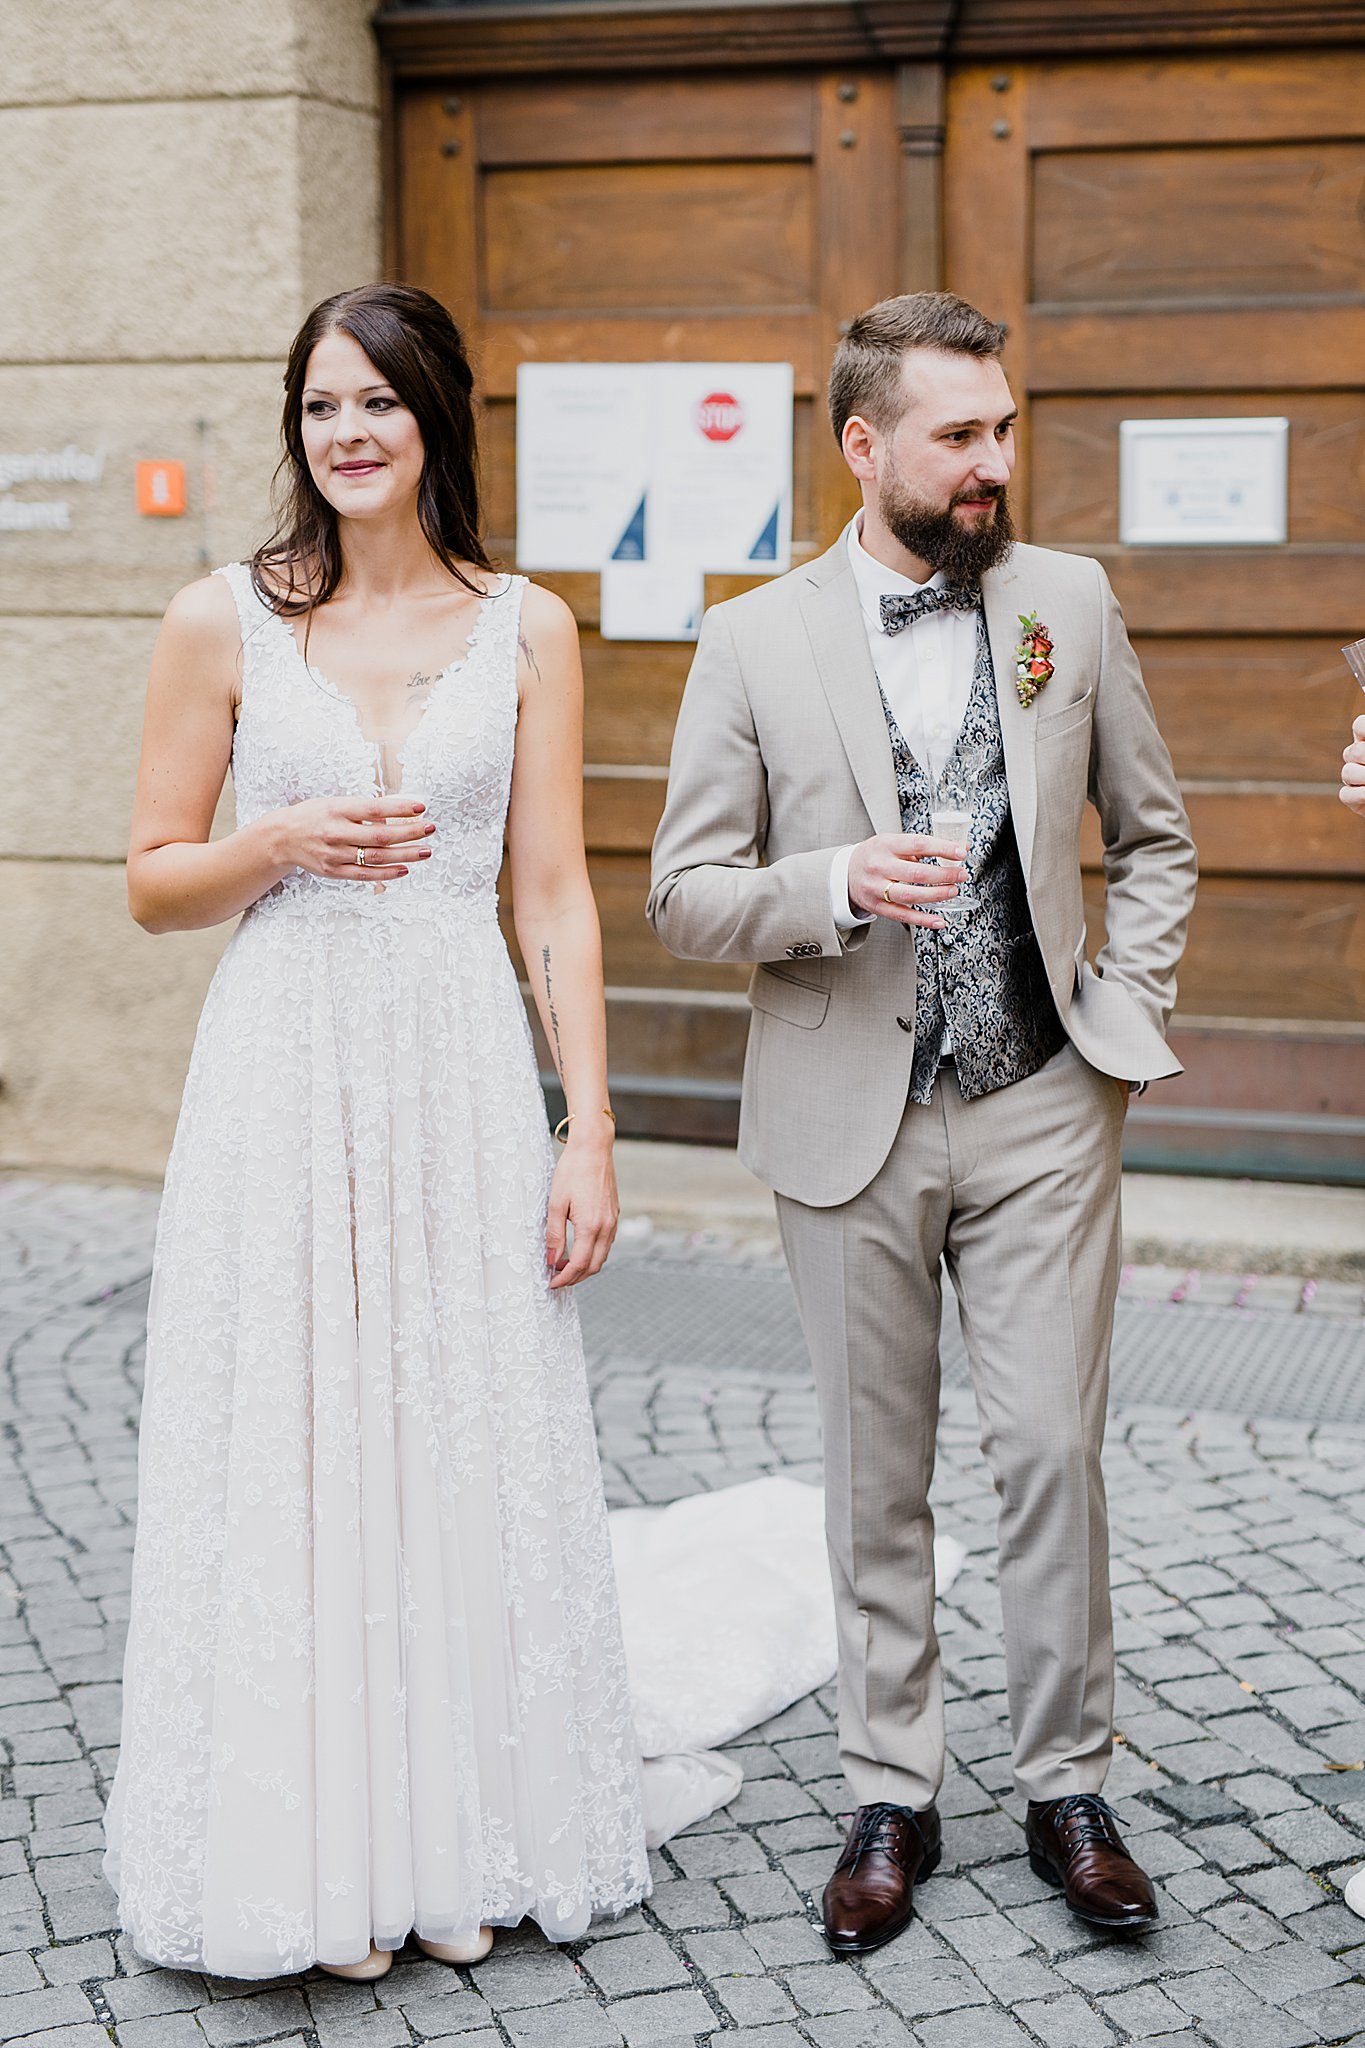 Hochzeitsfotograf-Oberpfalz-Bayern-Amberg_2681